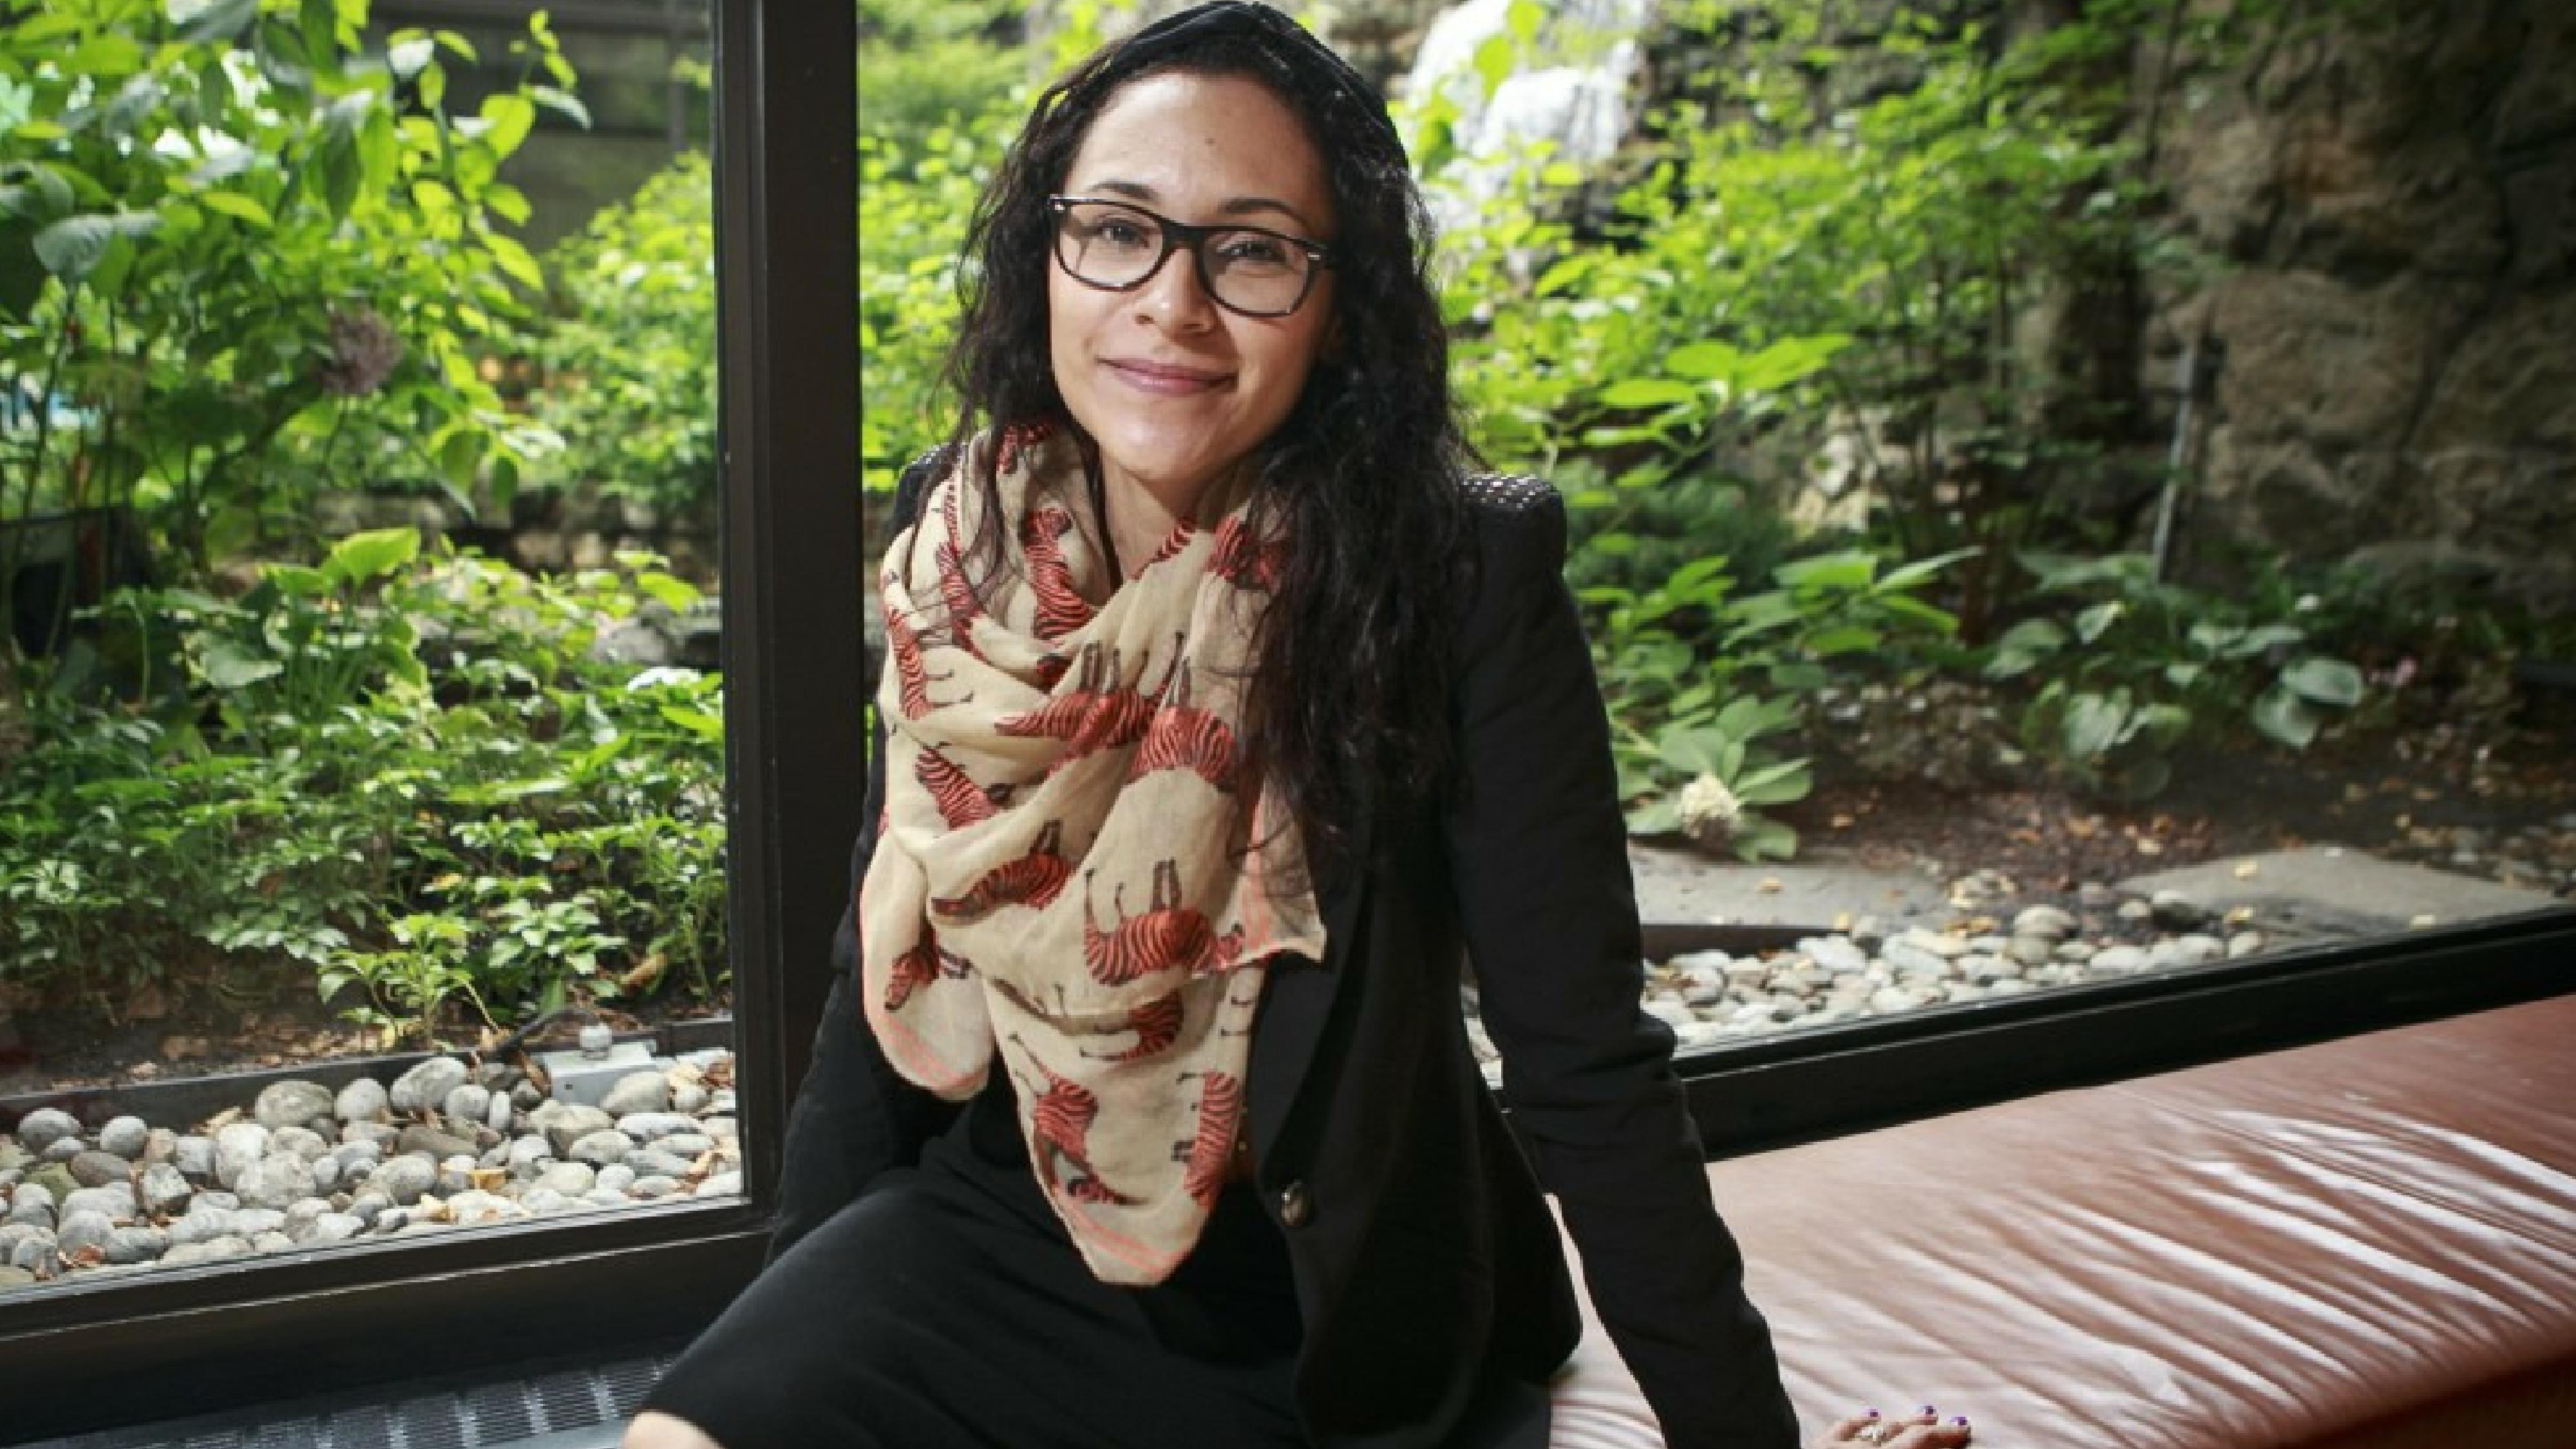 RomaFF11: Intervista alla regista messicana Claudia Sainte-Luce de La Caja Vacía